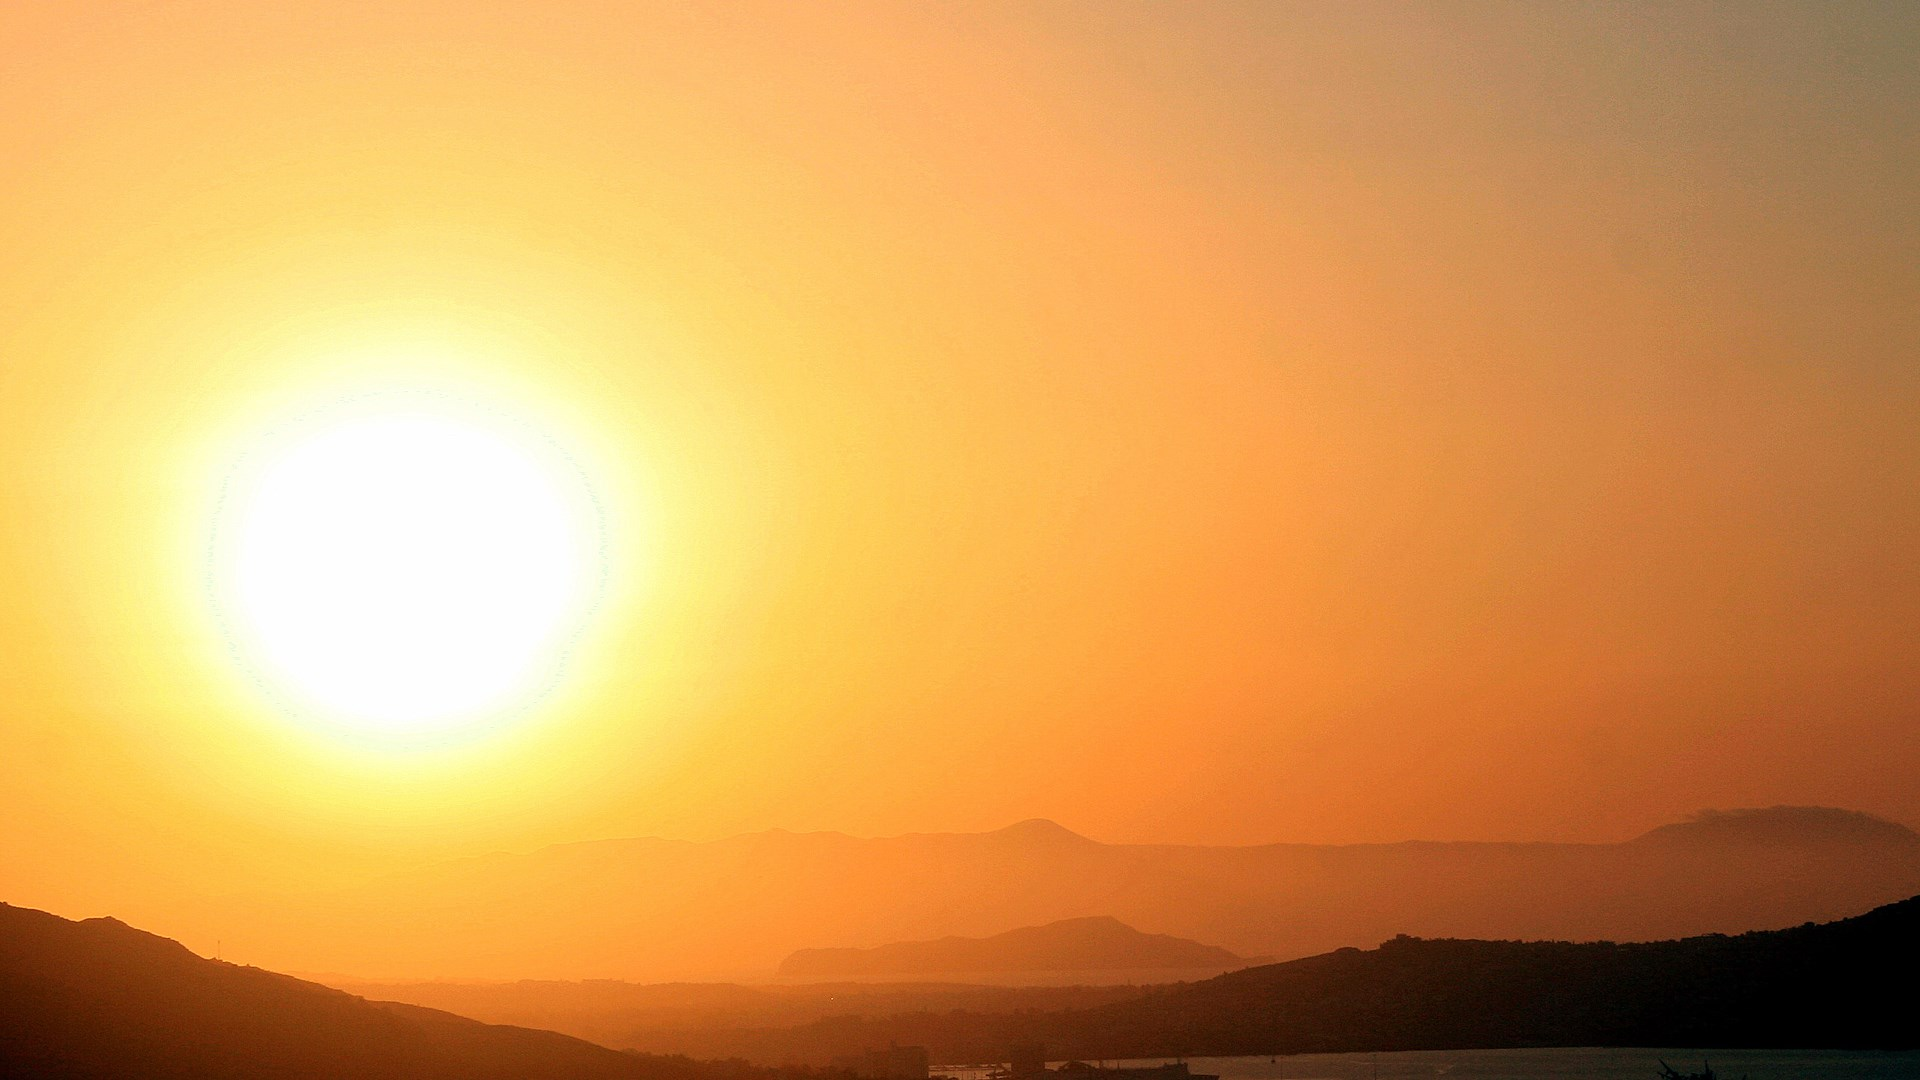 Sunset From Aptera Above Souda Bay, Chania, Crete | 30 Apr 2015 | Alargo